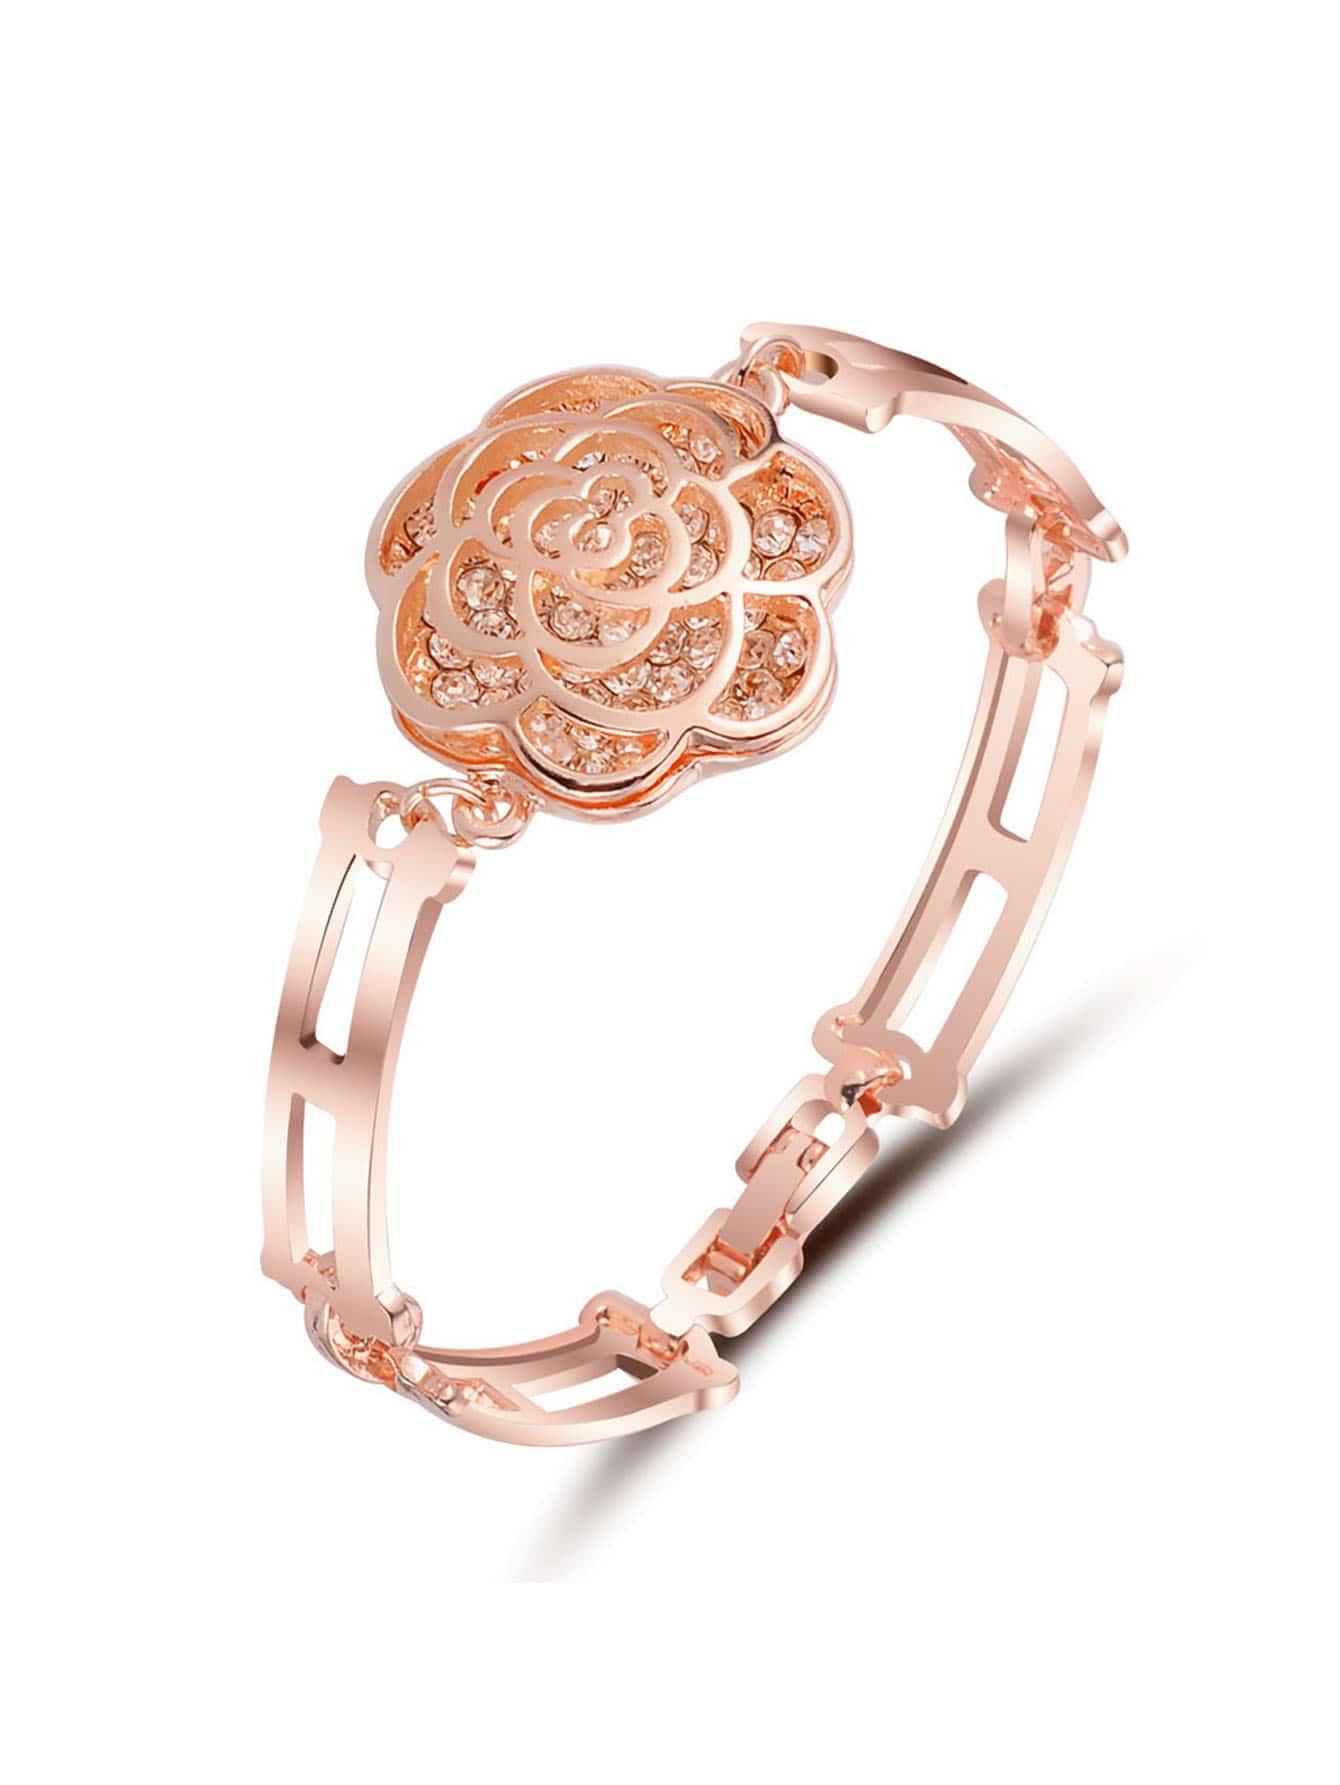 Rhinestone Rose Design Bracelet